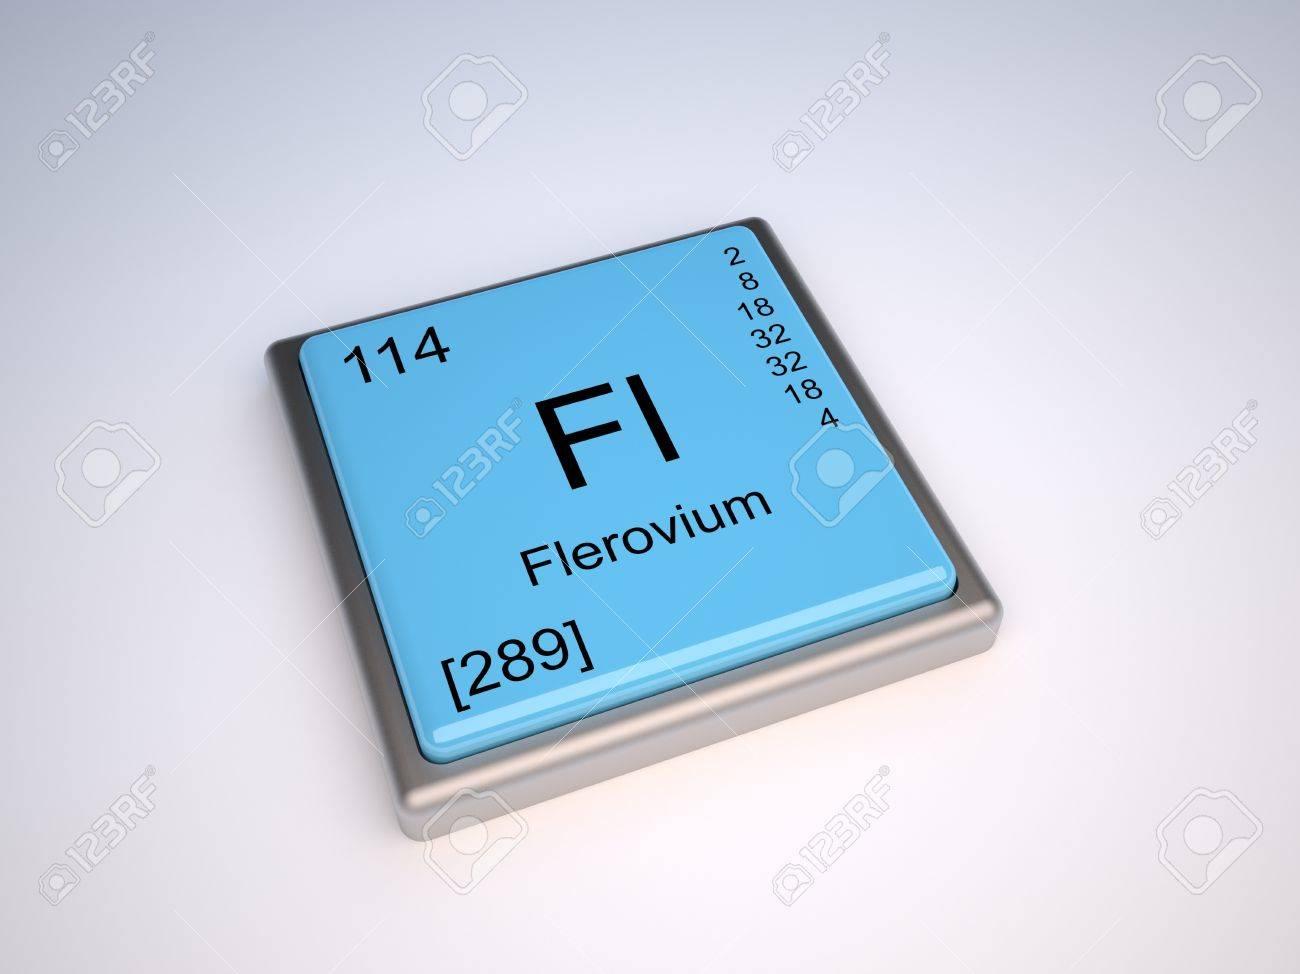 Flerovium 114 new element of the periodic table stock photo flerovium 114 new element of the periodic table stock photo 12436079 gamestrikefo Images